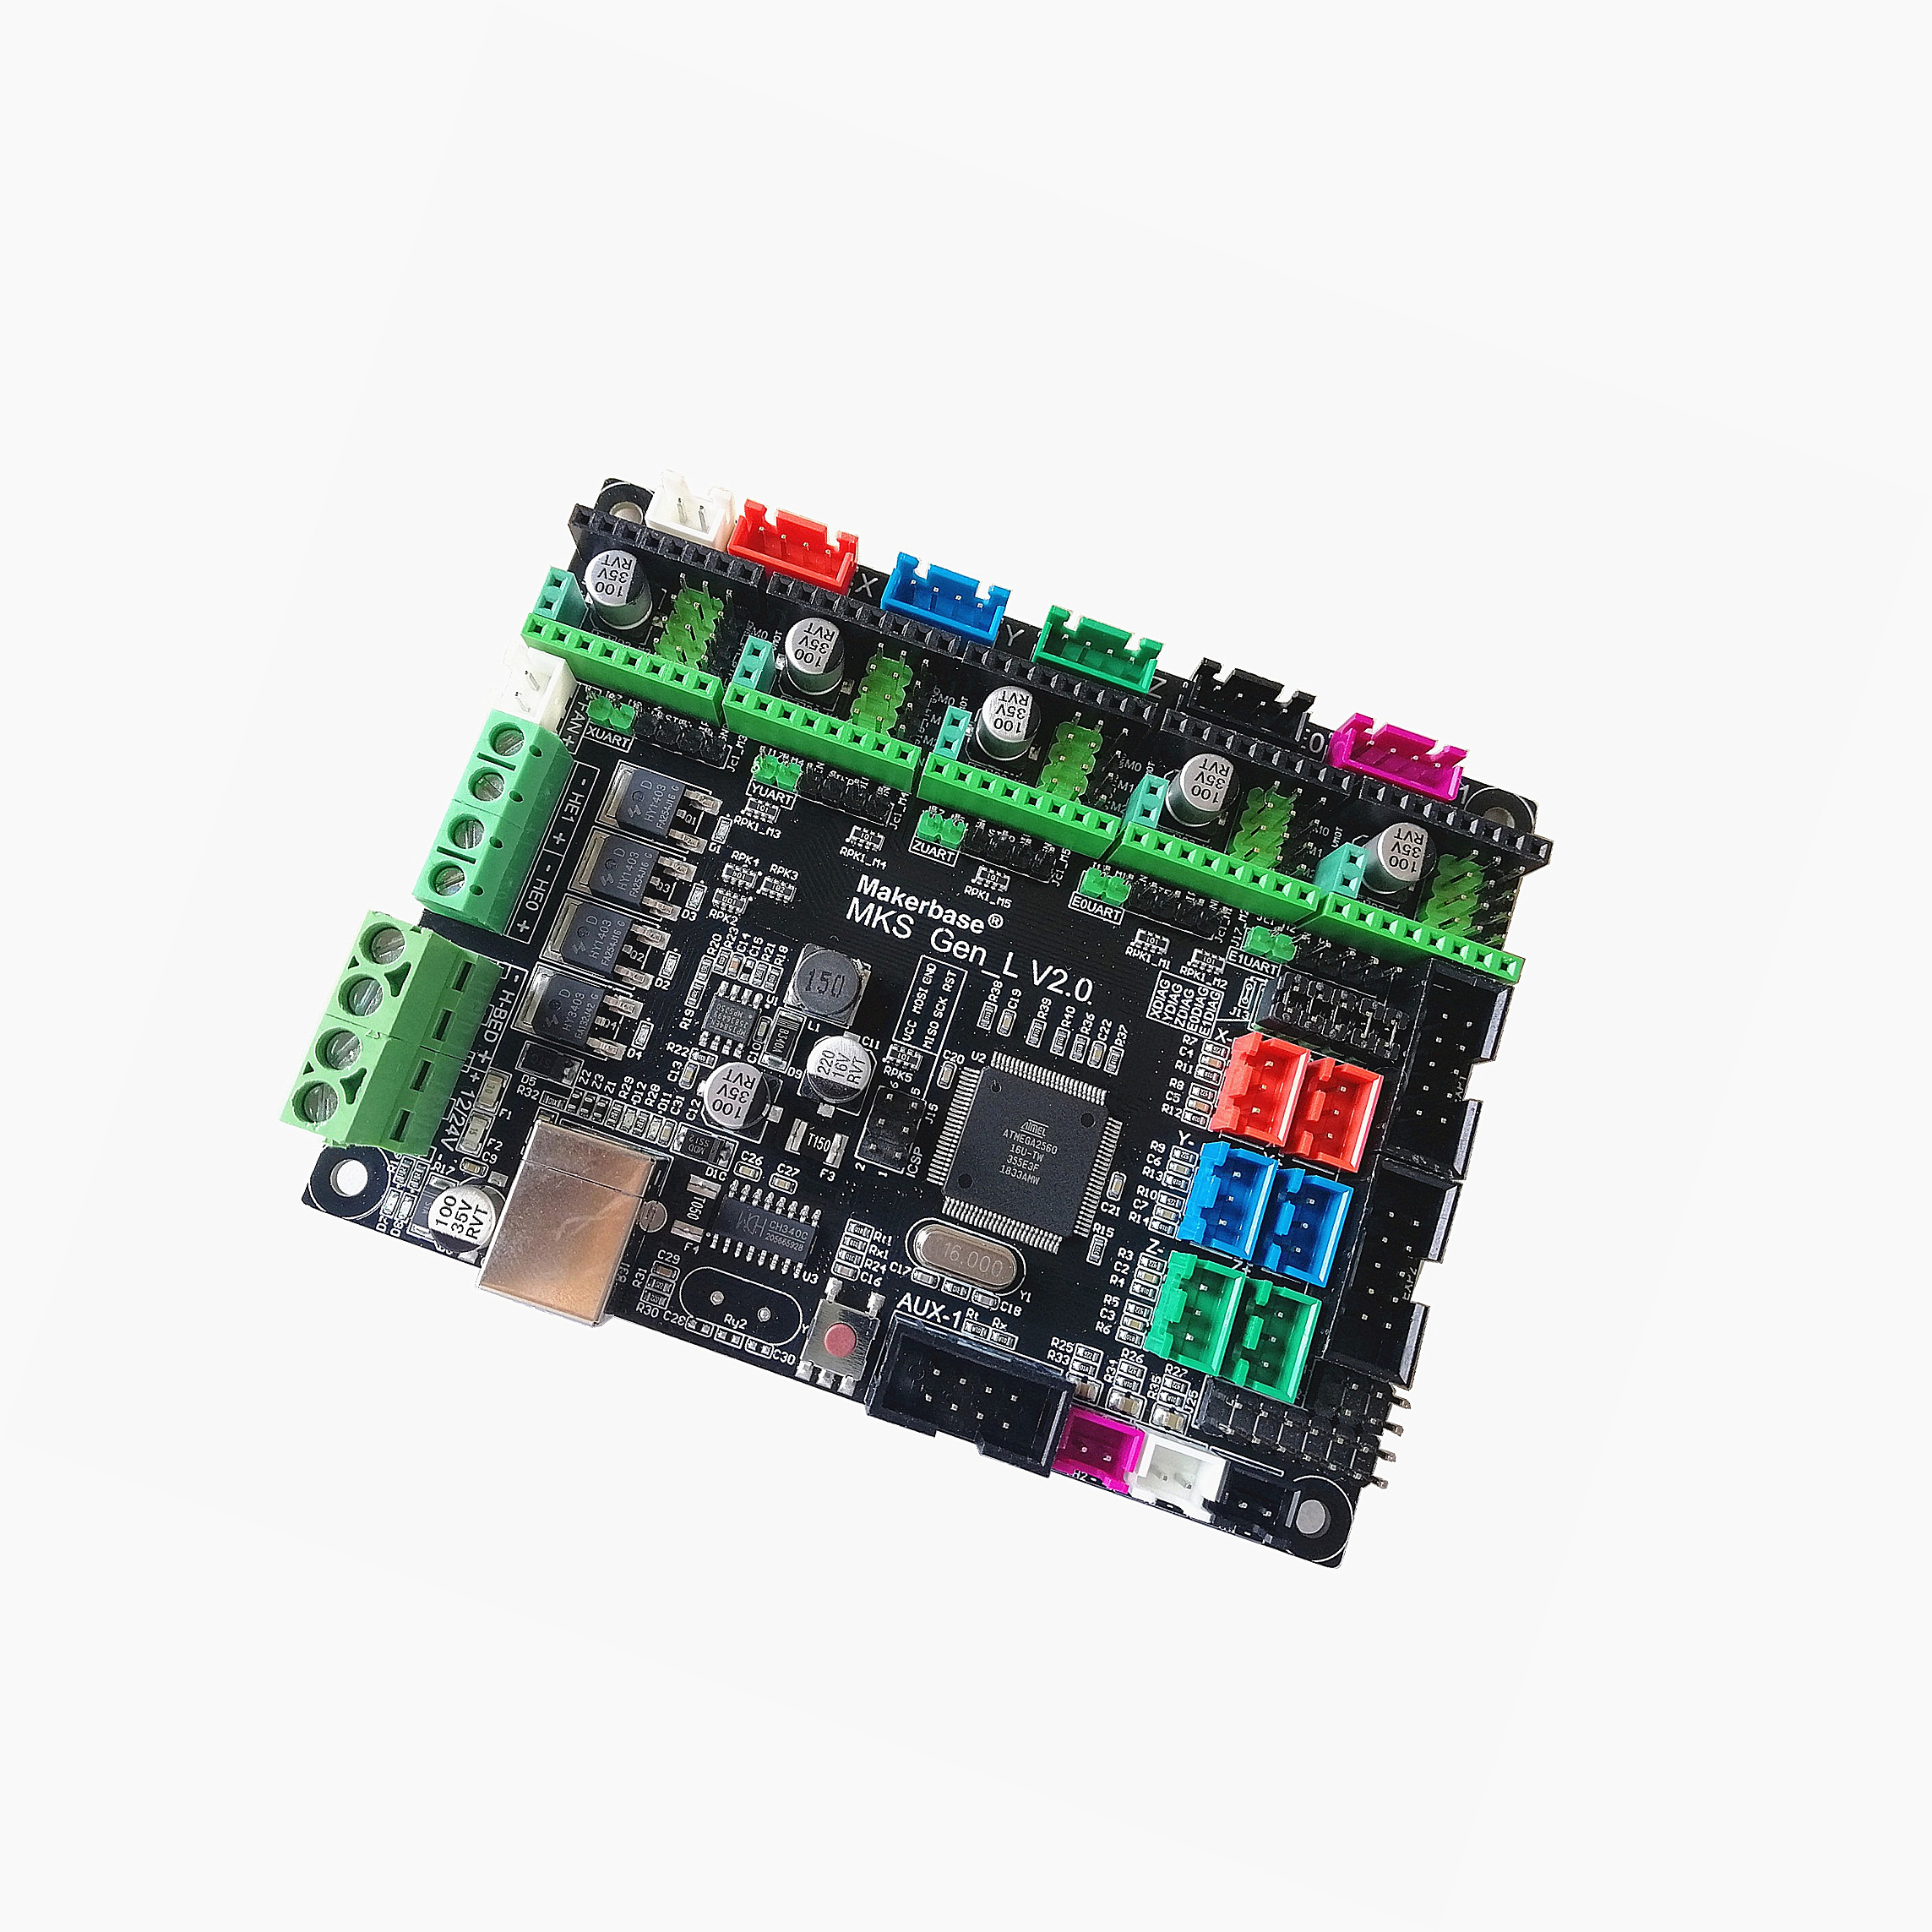 MKS GEN-L V1.0 Mainboard Motherboard Control For Tevo Tarantula Printer Reprap